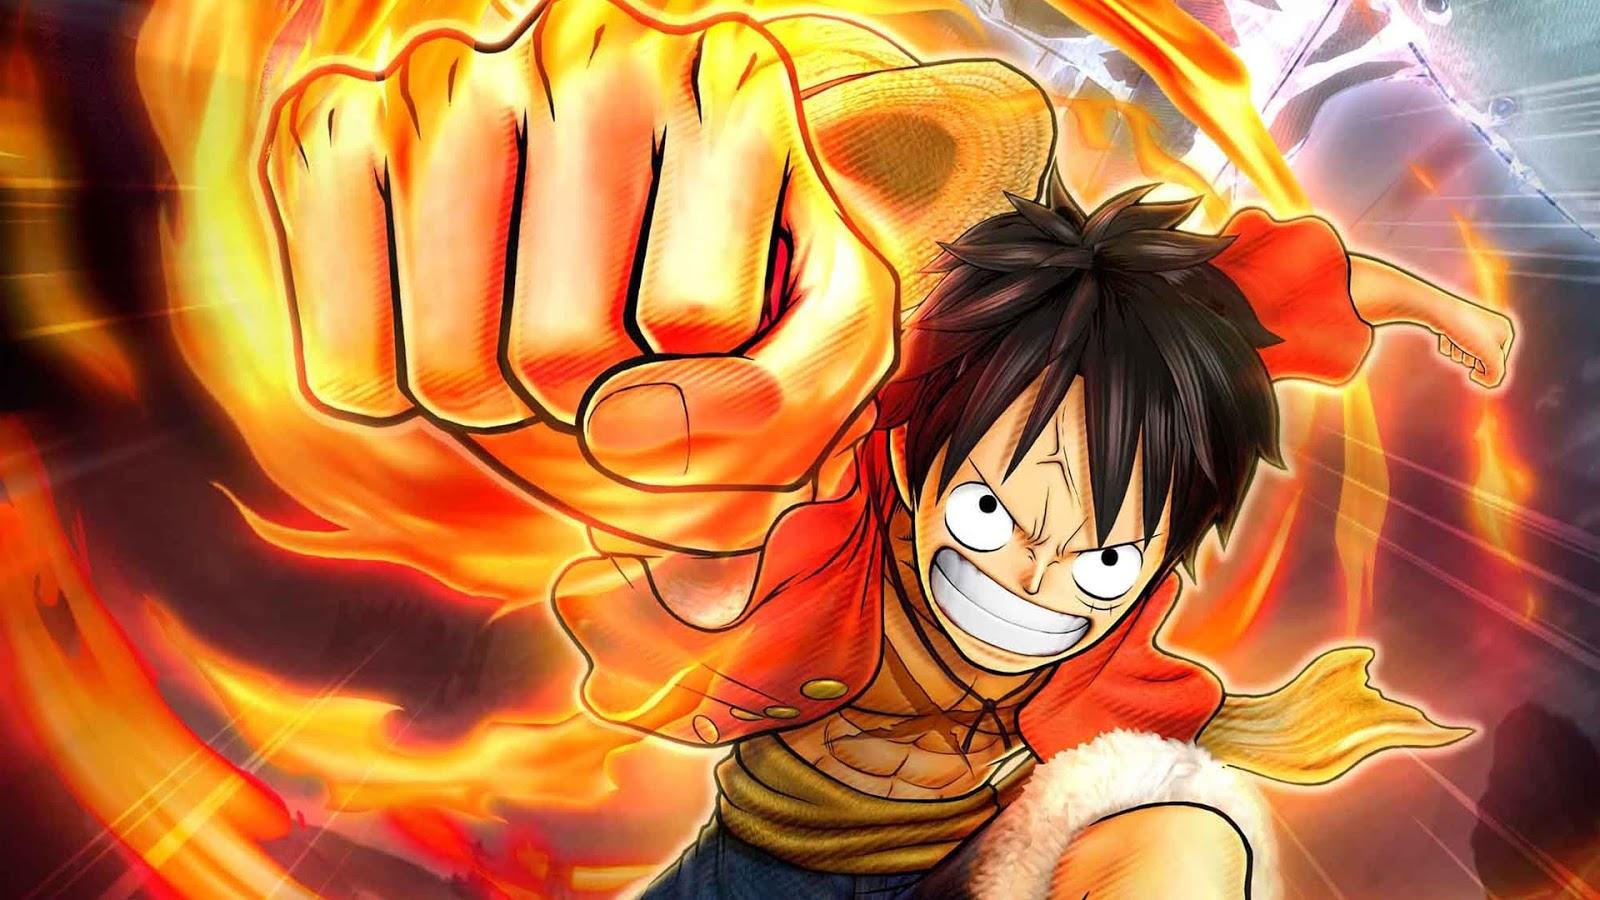 Top 45 hình nền One Piece - Hình nền vua hải tặc One Piece Full HD